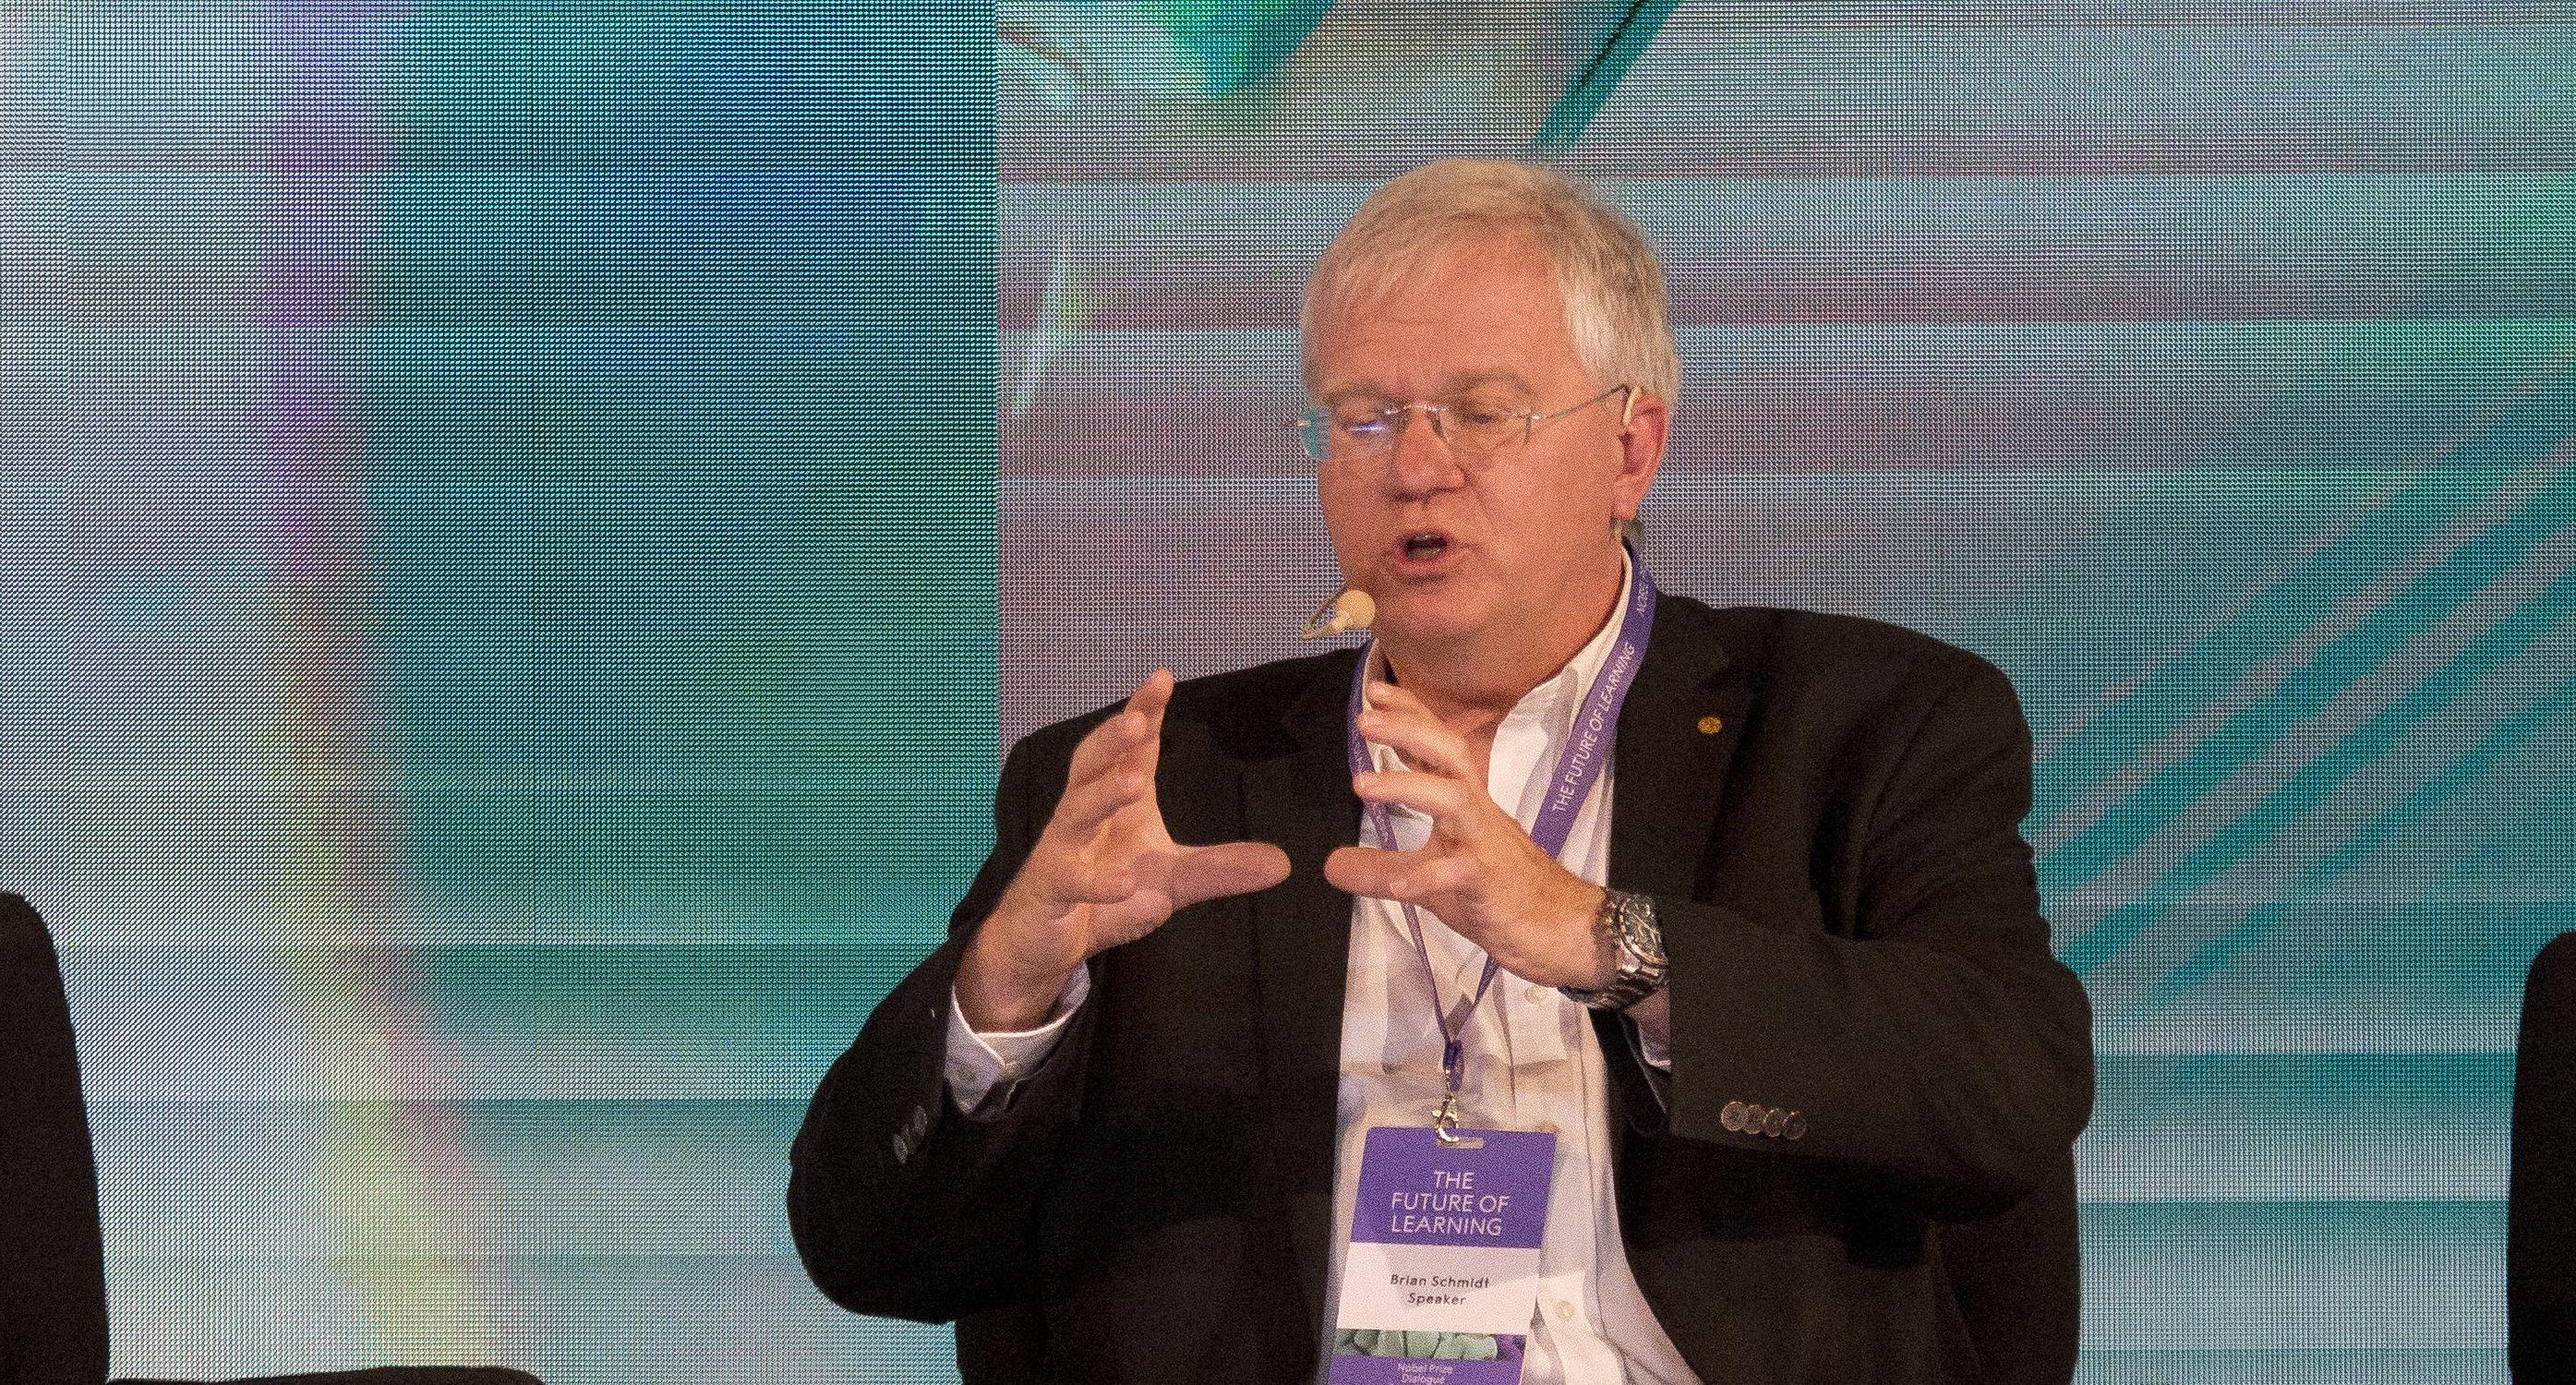 Schmidt visita ocasionalmente Chile para dar charlas de astronomía | Congreso Futuro